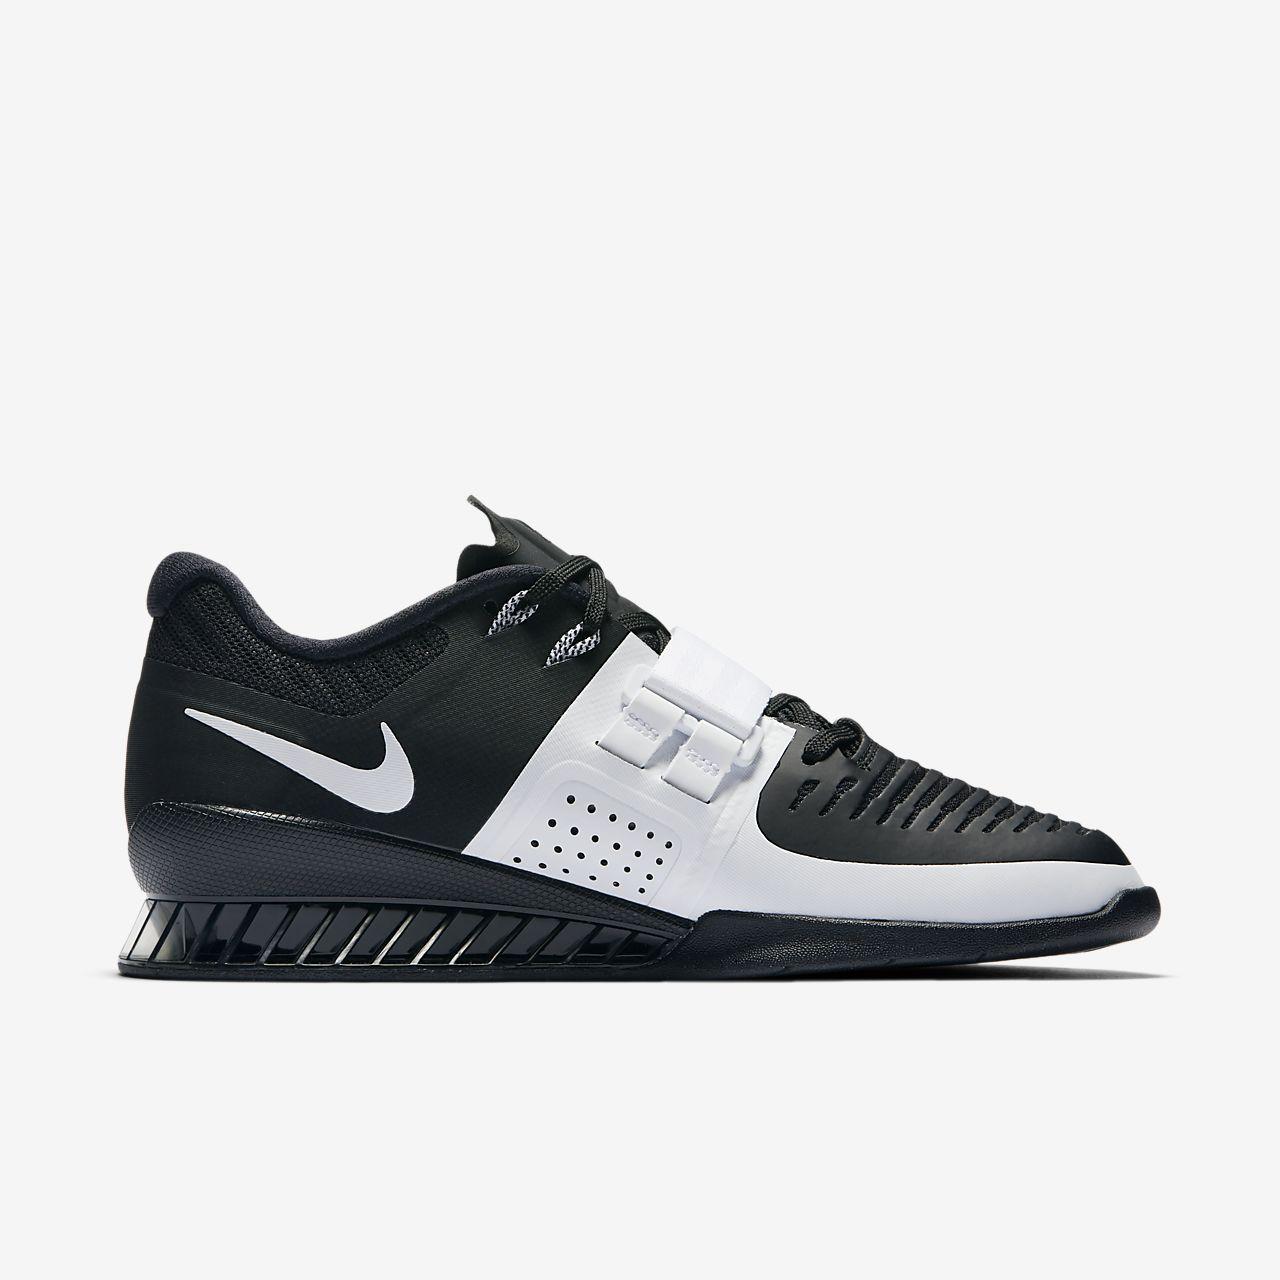 Donna Nike Air Max Motion LW Scarpe Da Ginnastica Taglia 6 eu40 255 cm